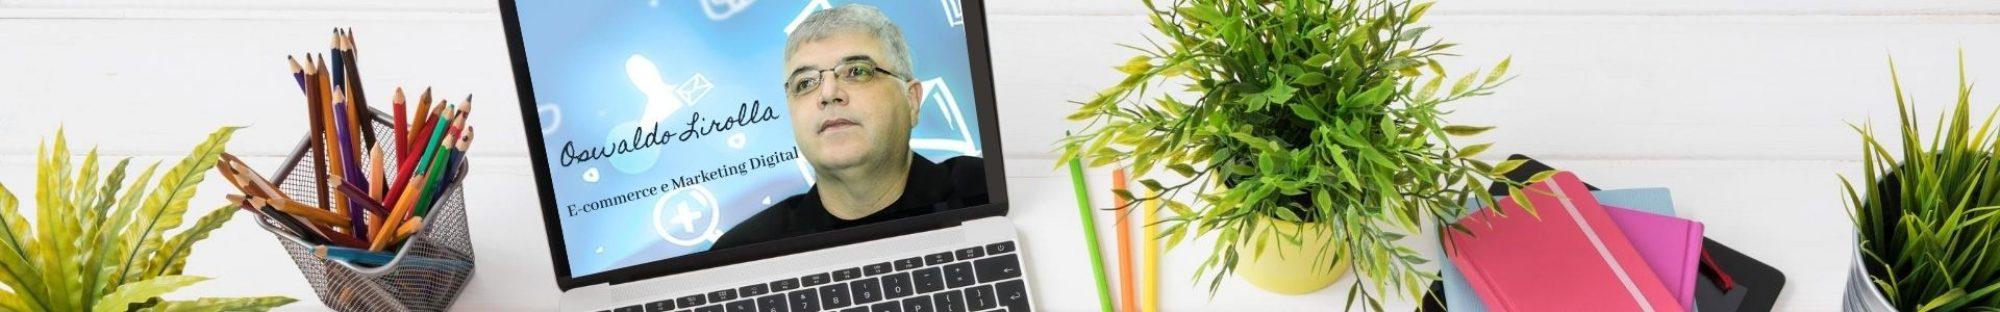 Blog Lirolla | E-commerce | Marketing Digital ! Negócios online